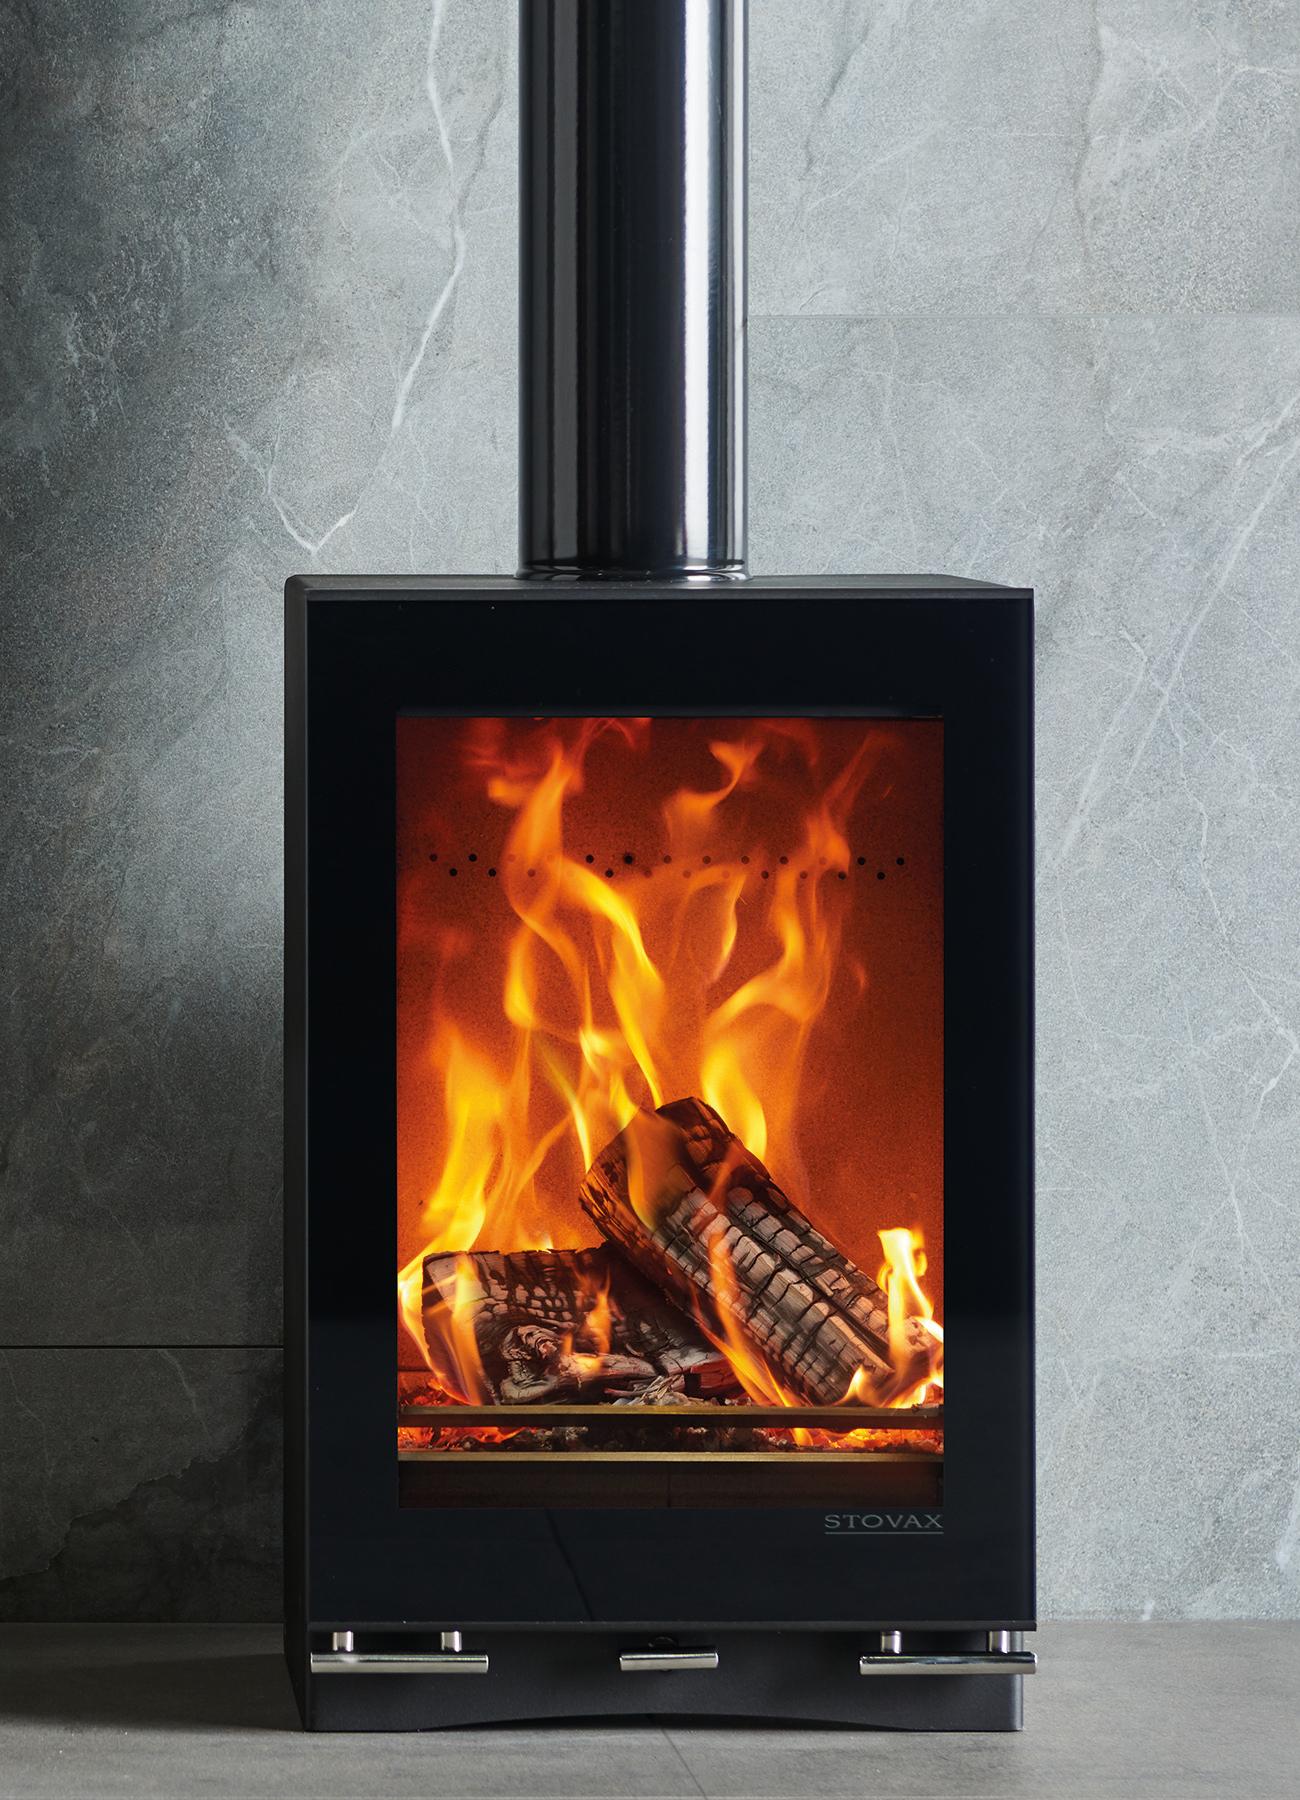 Stovax Riva Vision Midi T Eco Fire Wood Burning Stove